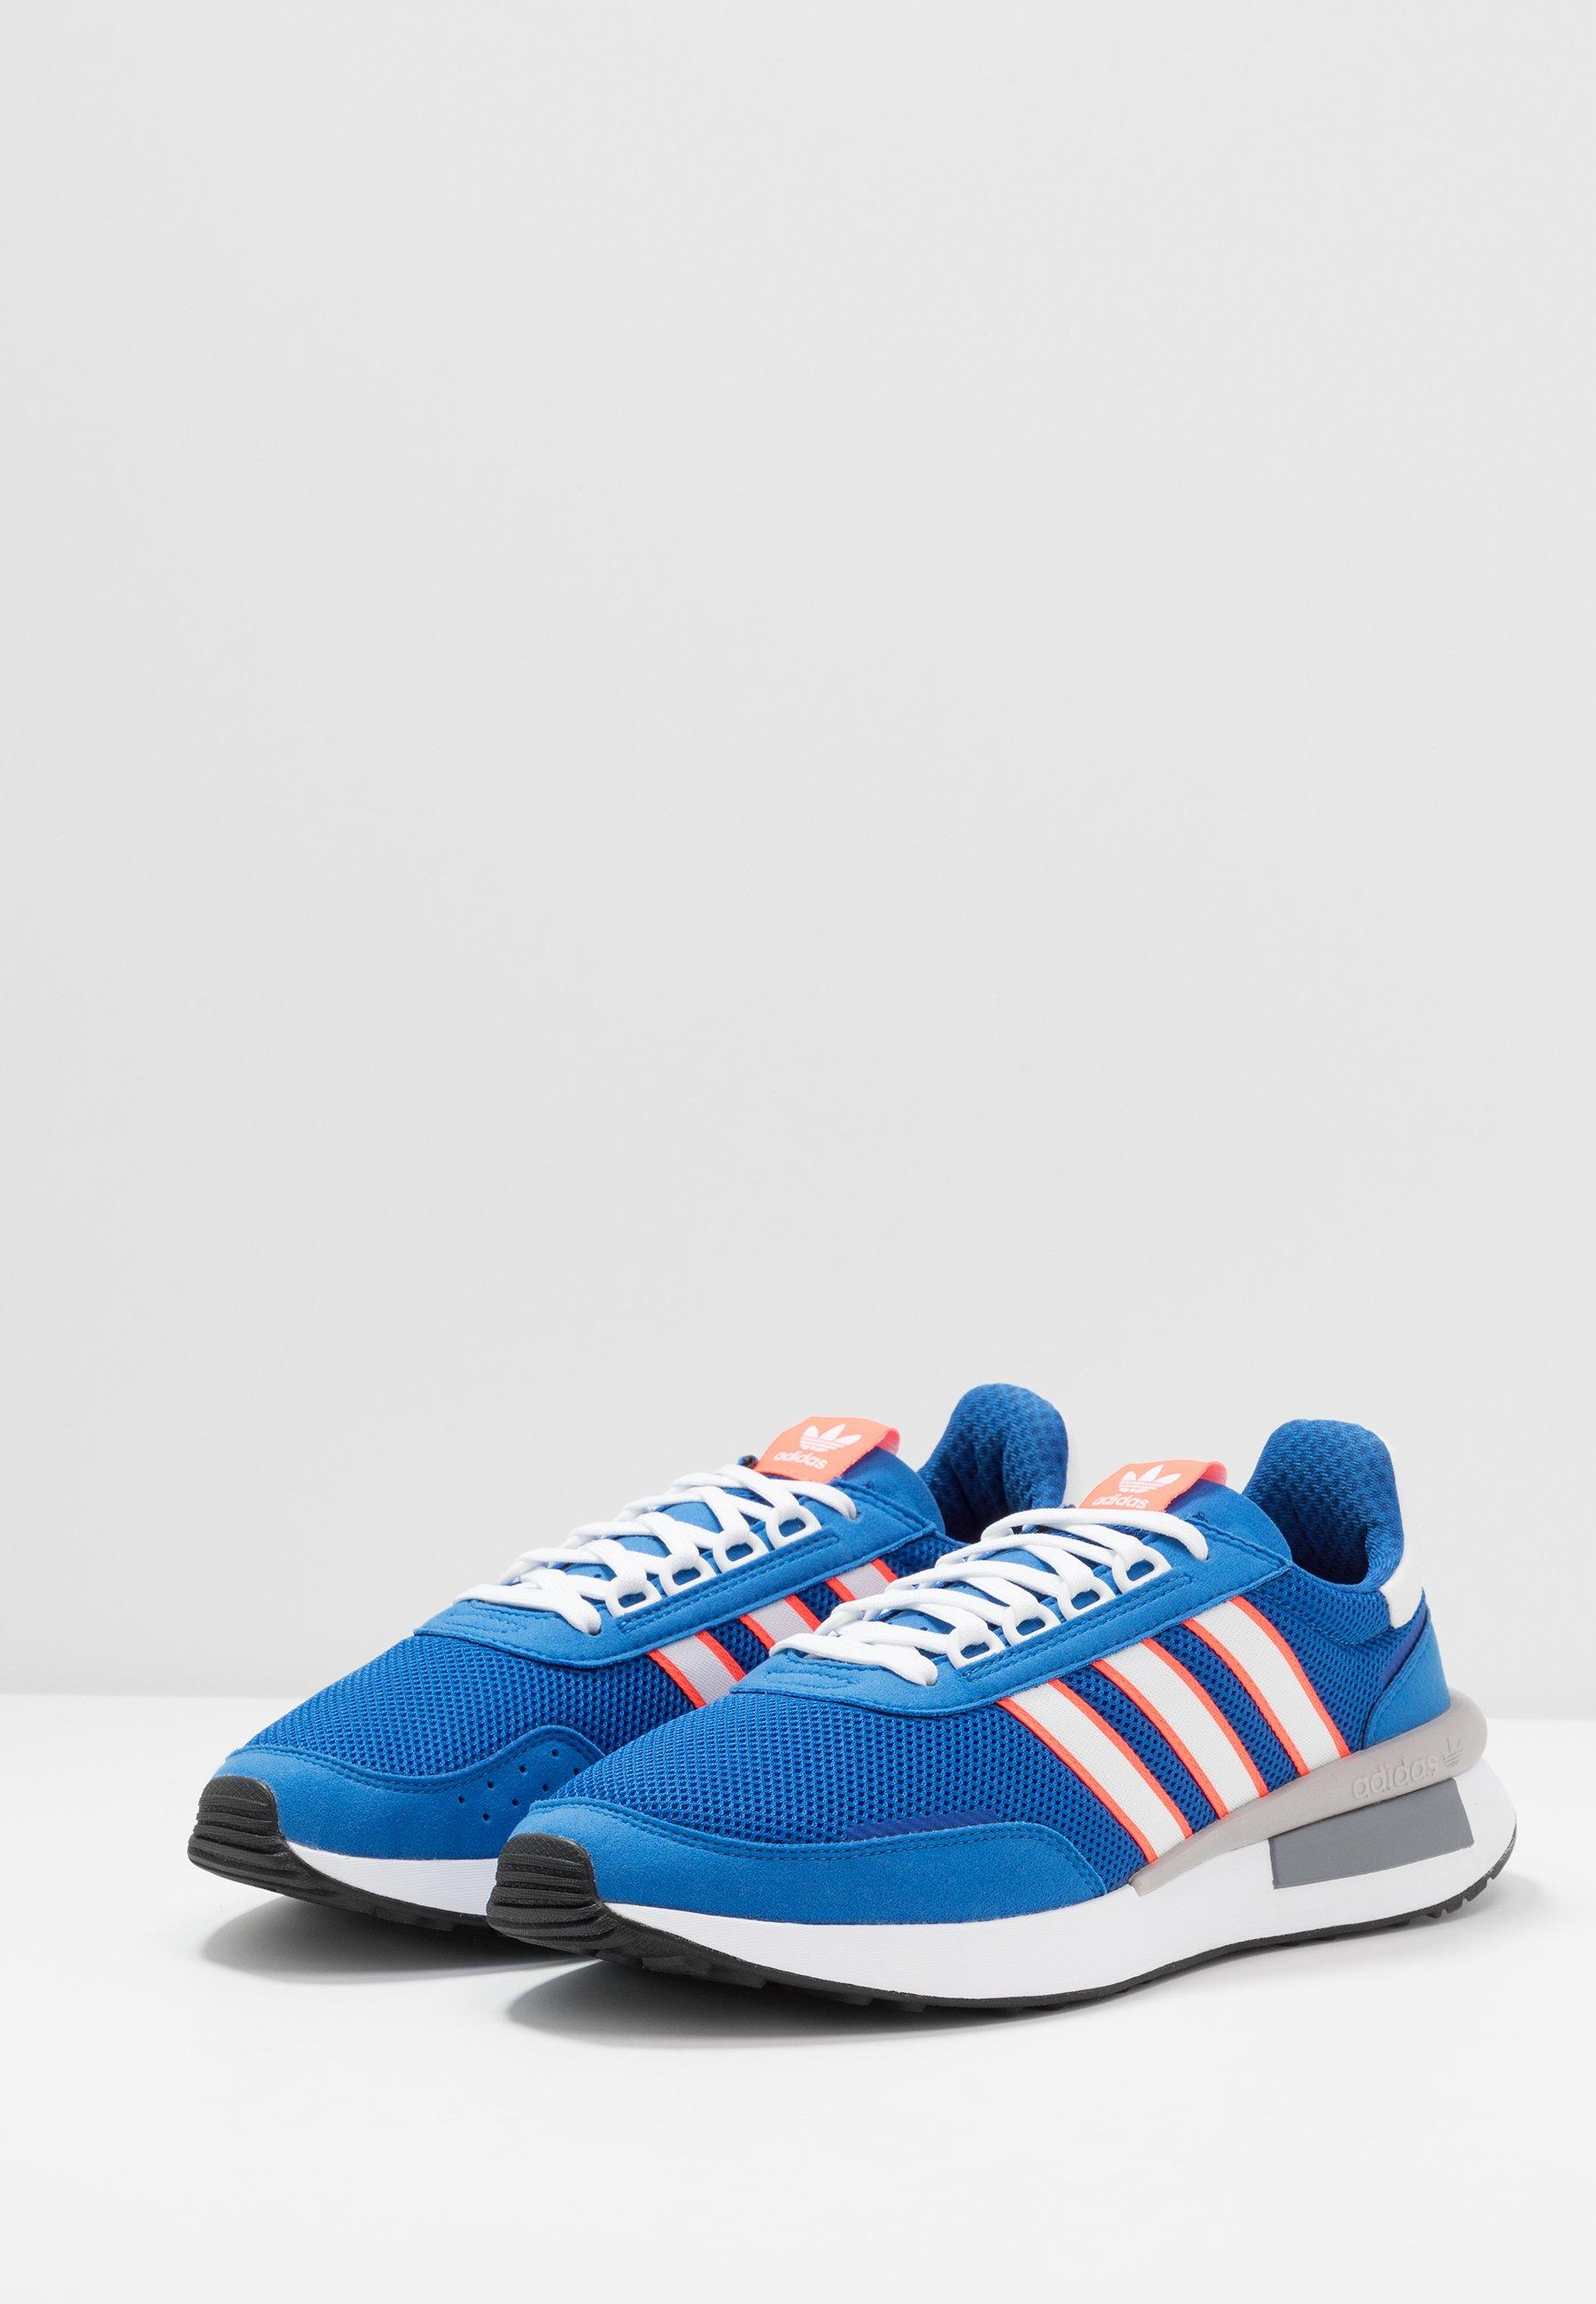 adidas Originals RETROSET - Sneaker low - blue/footwear white/solar red/blau - Herrenschuhe l68Wz